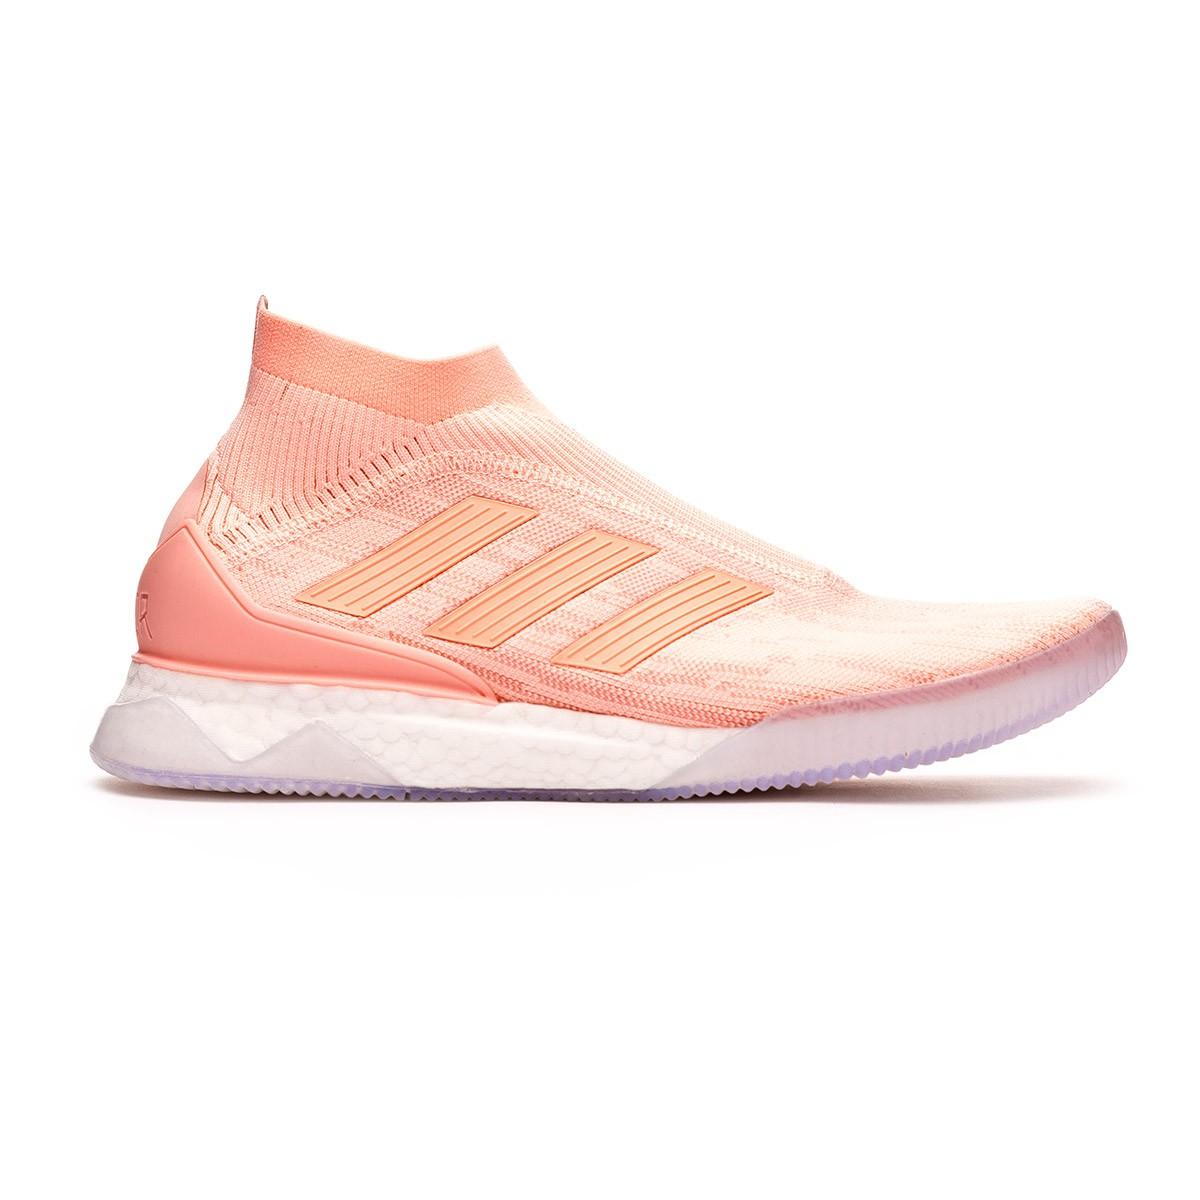 151cd3ff6023 Trainers adidas Predator Tango 18+ TR Clear orange-Trace pink - Football  store Fútbol Emotion